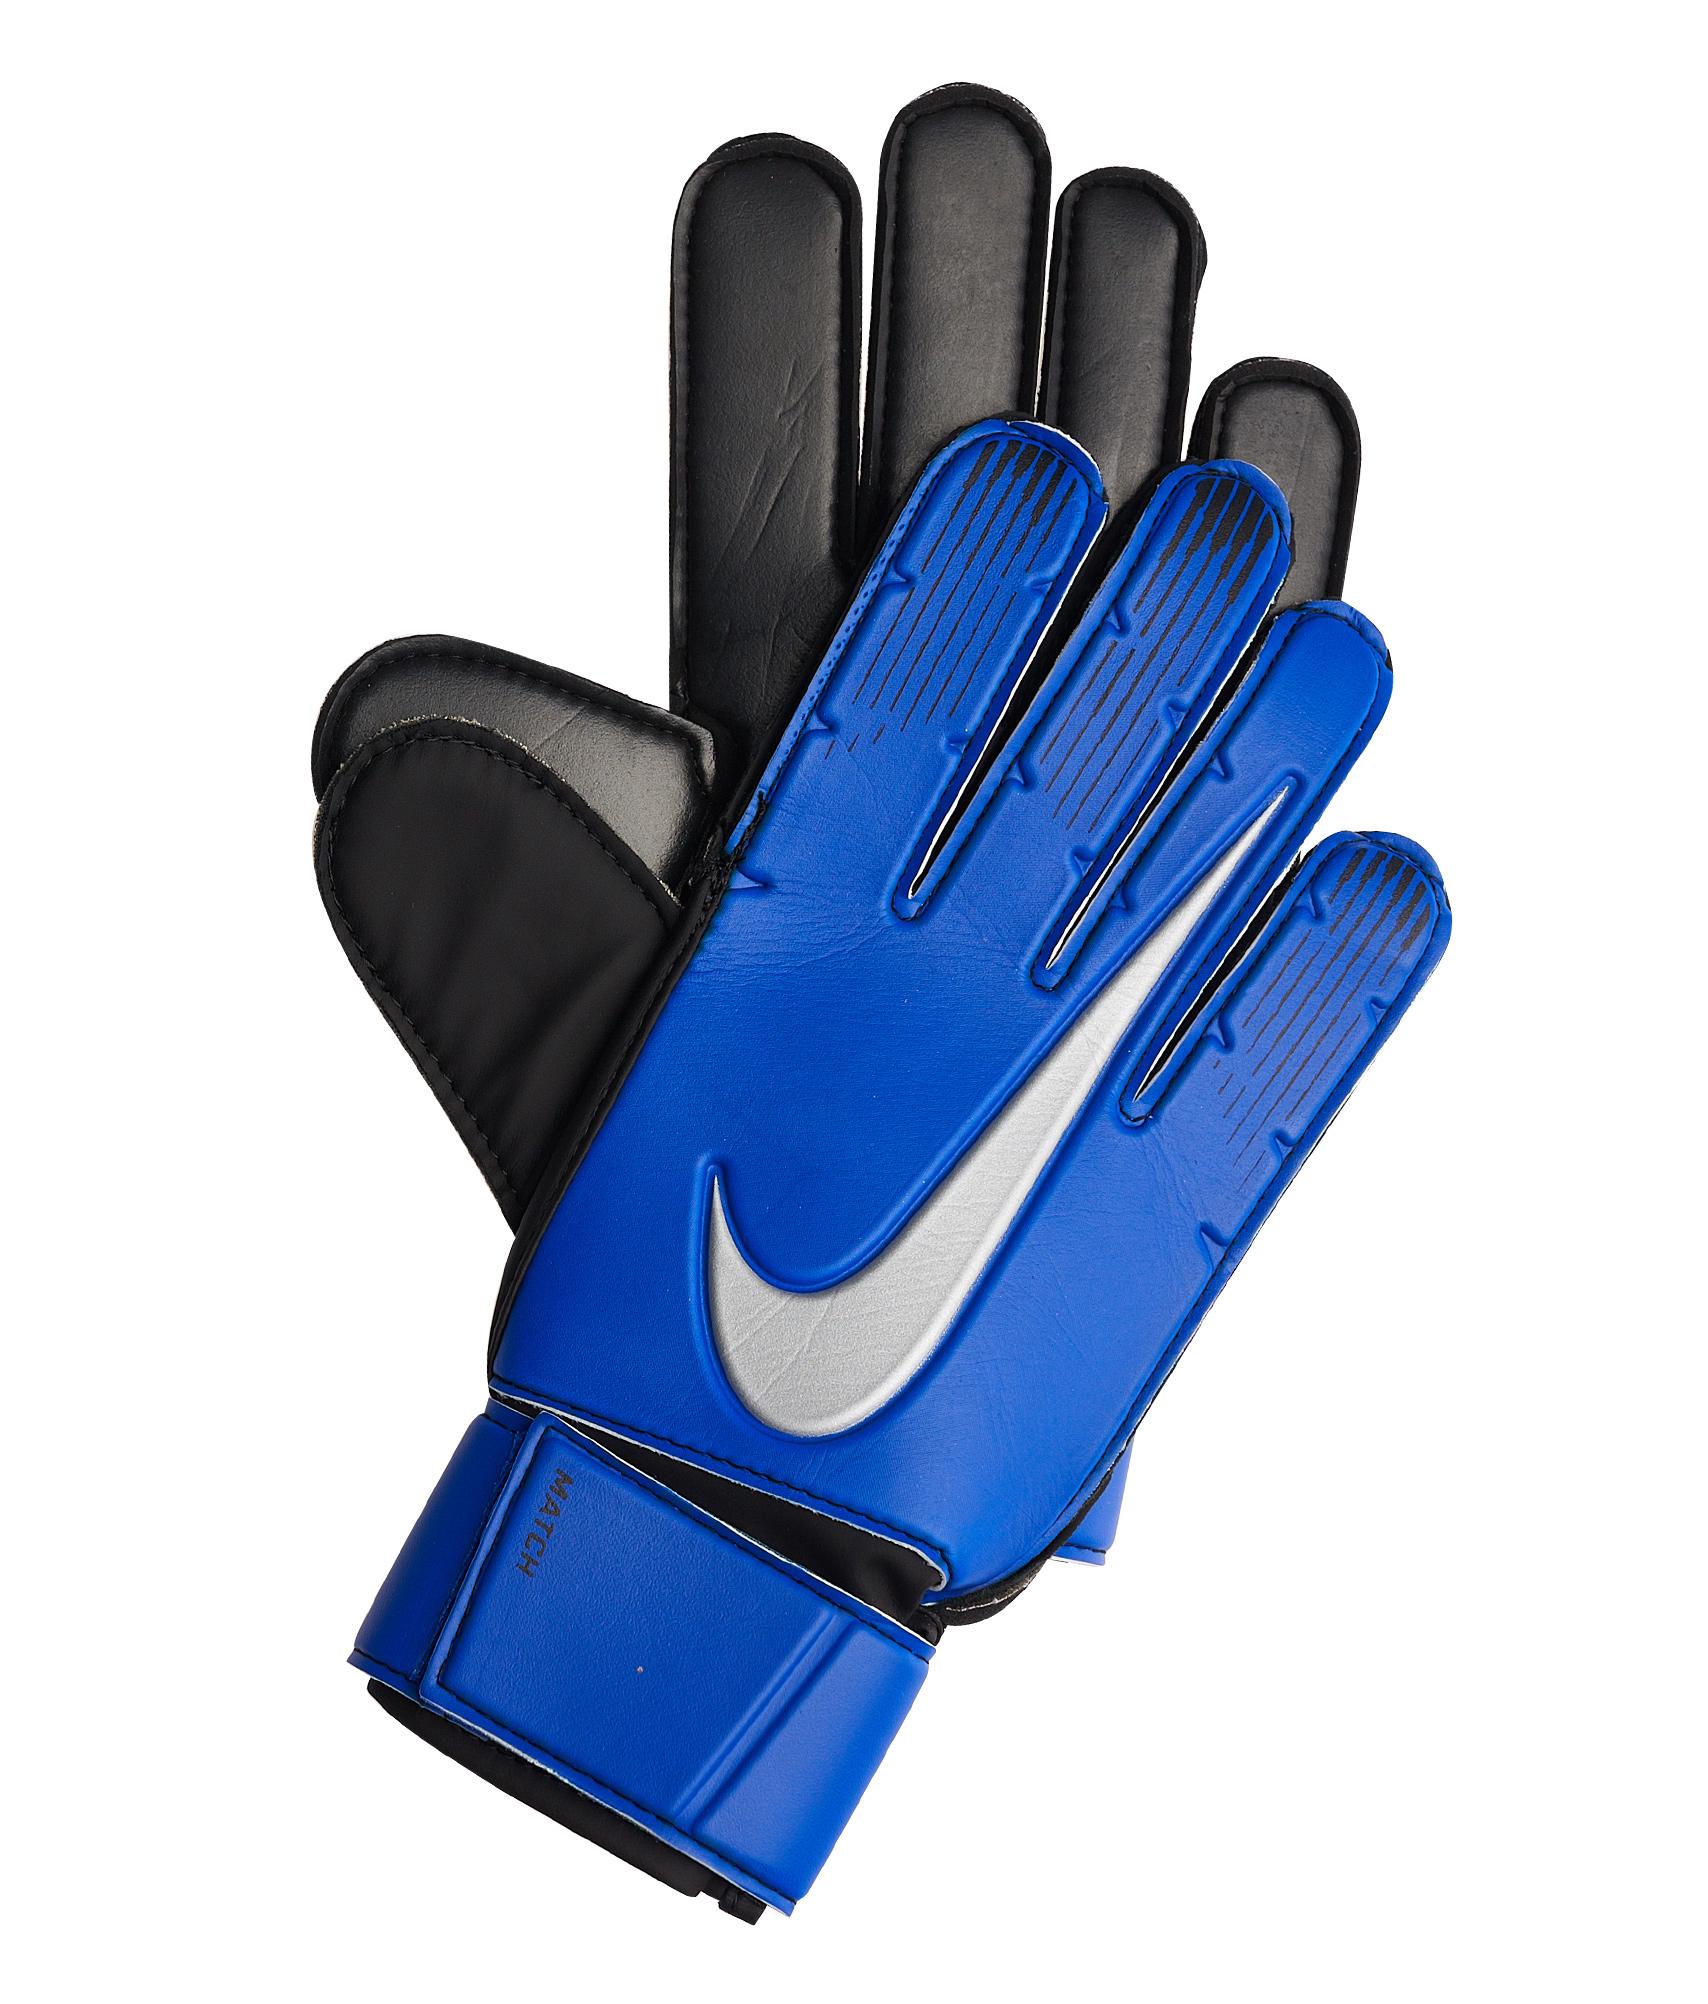 Перчатки вратарские Nike Nike Цвет-Синий nike перчатки для фитнеса женские nike accessories